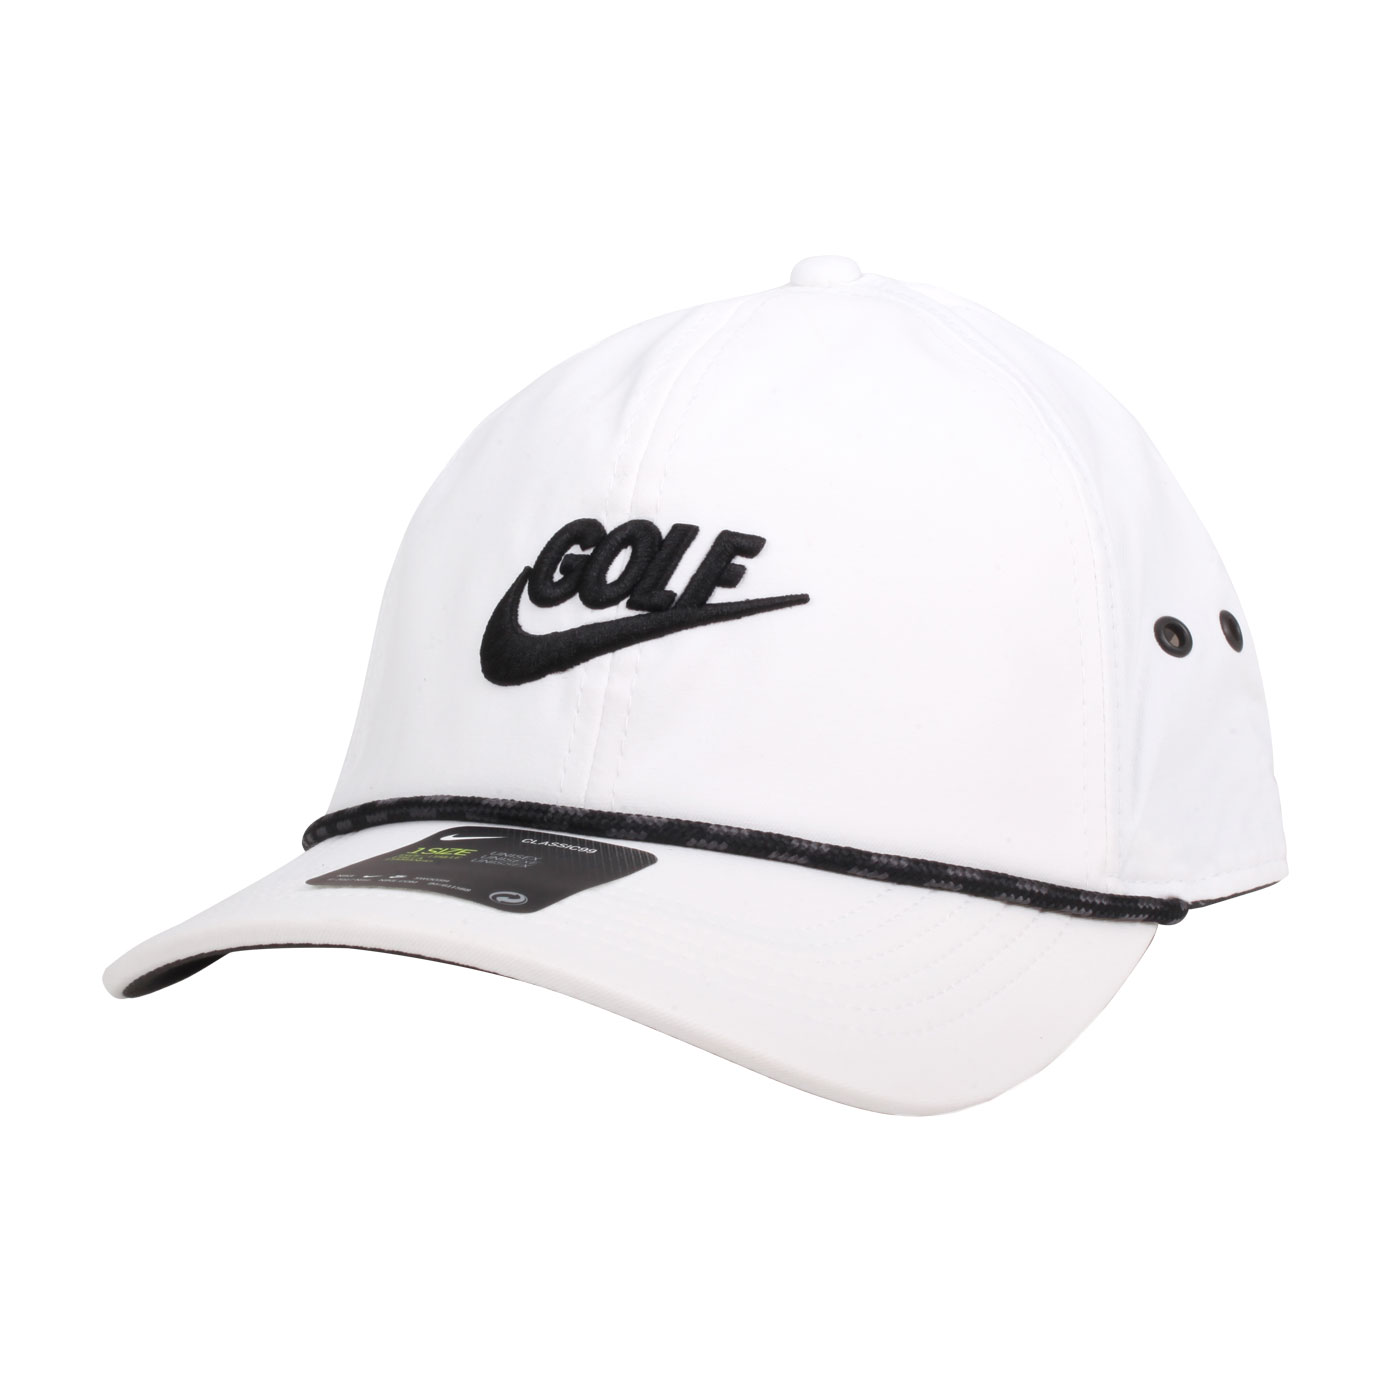 NIKE 高爾夫運動帽  GOLFBV8229-010 - 白黑